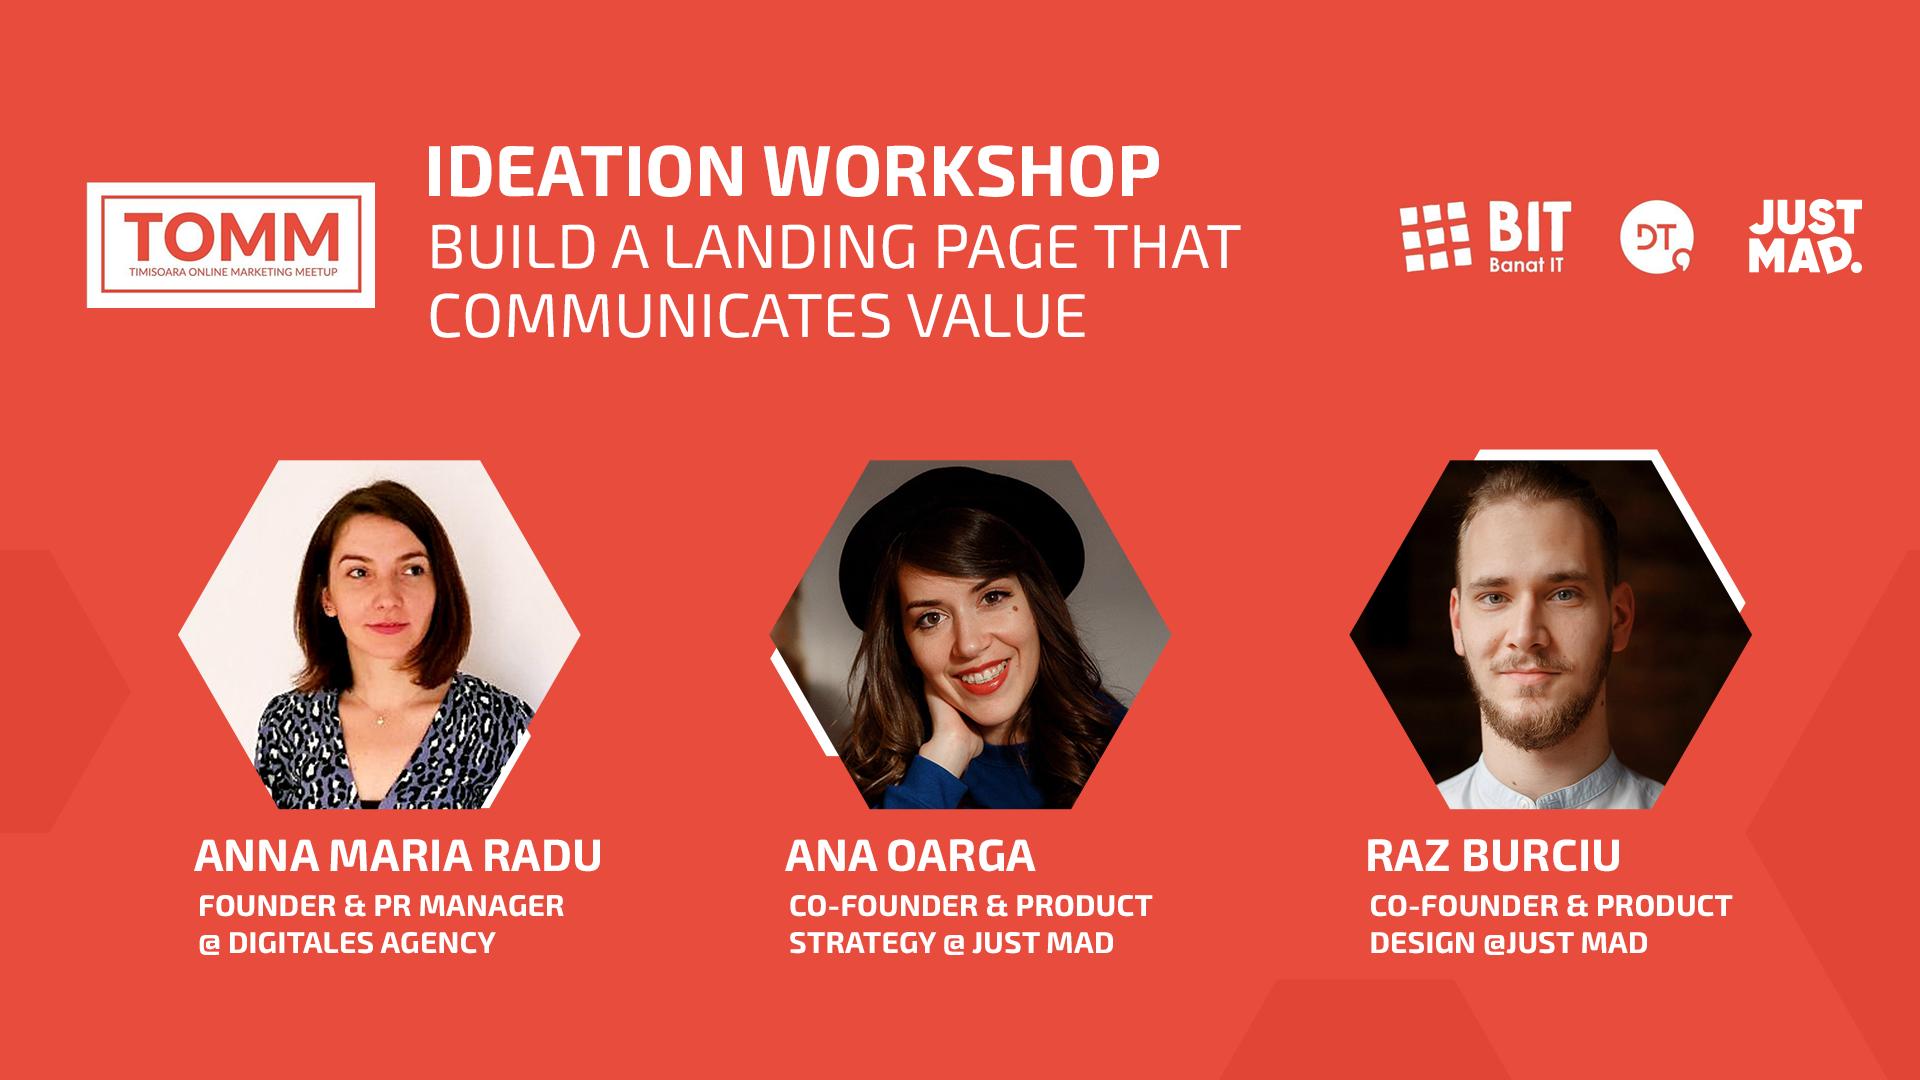 Ideation Workshop: Build a Landing Page that Communicates Value